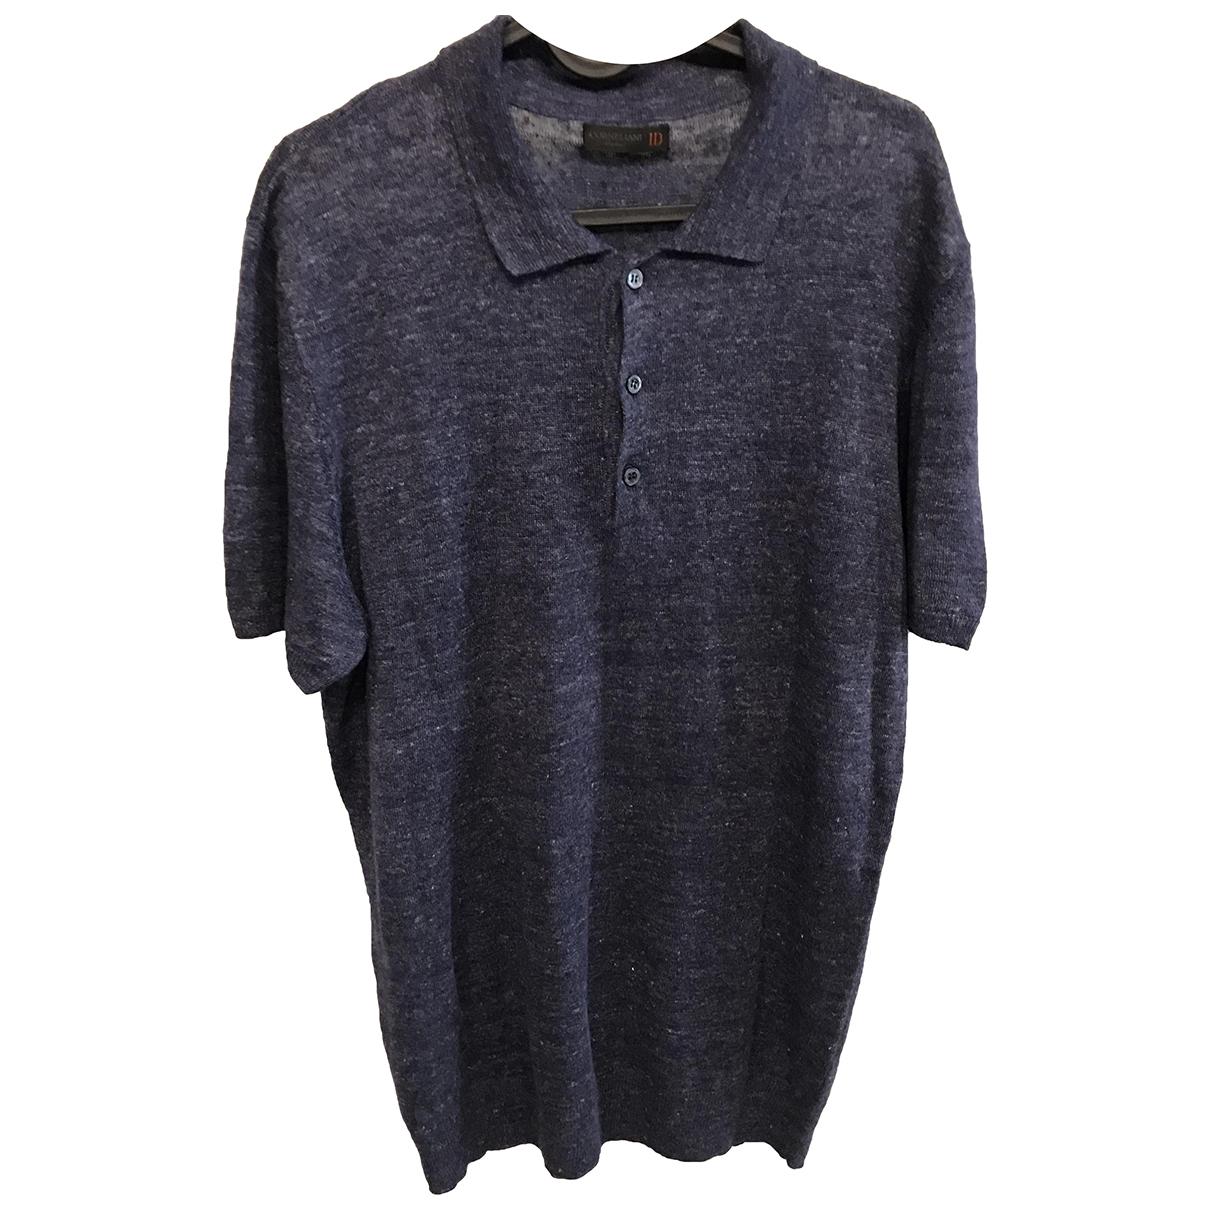 Corneliani - Polos   pour homme en lin - bleu